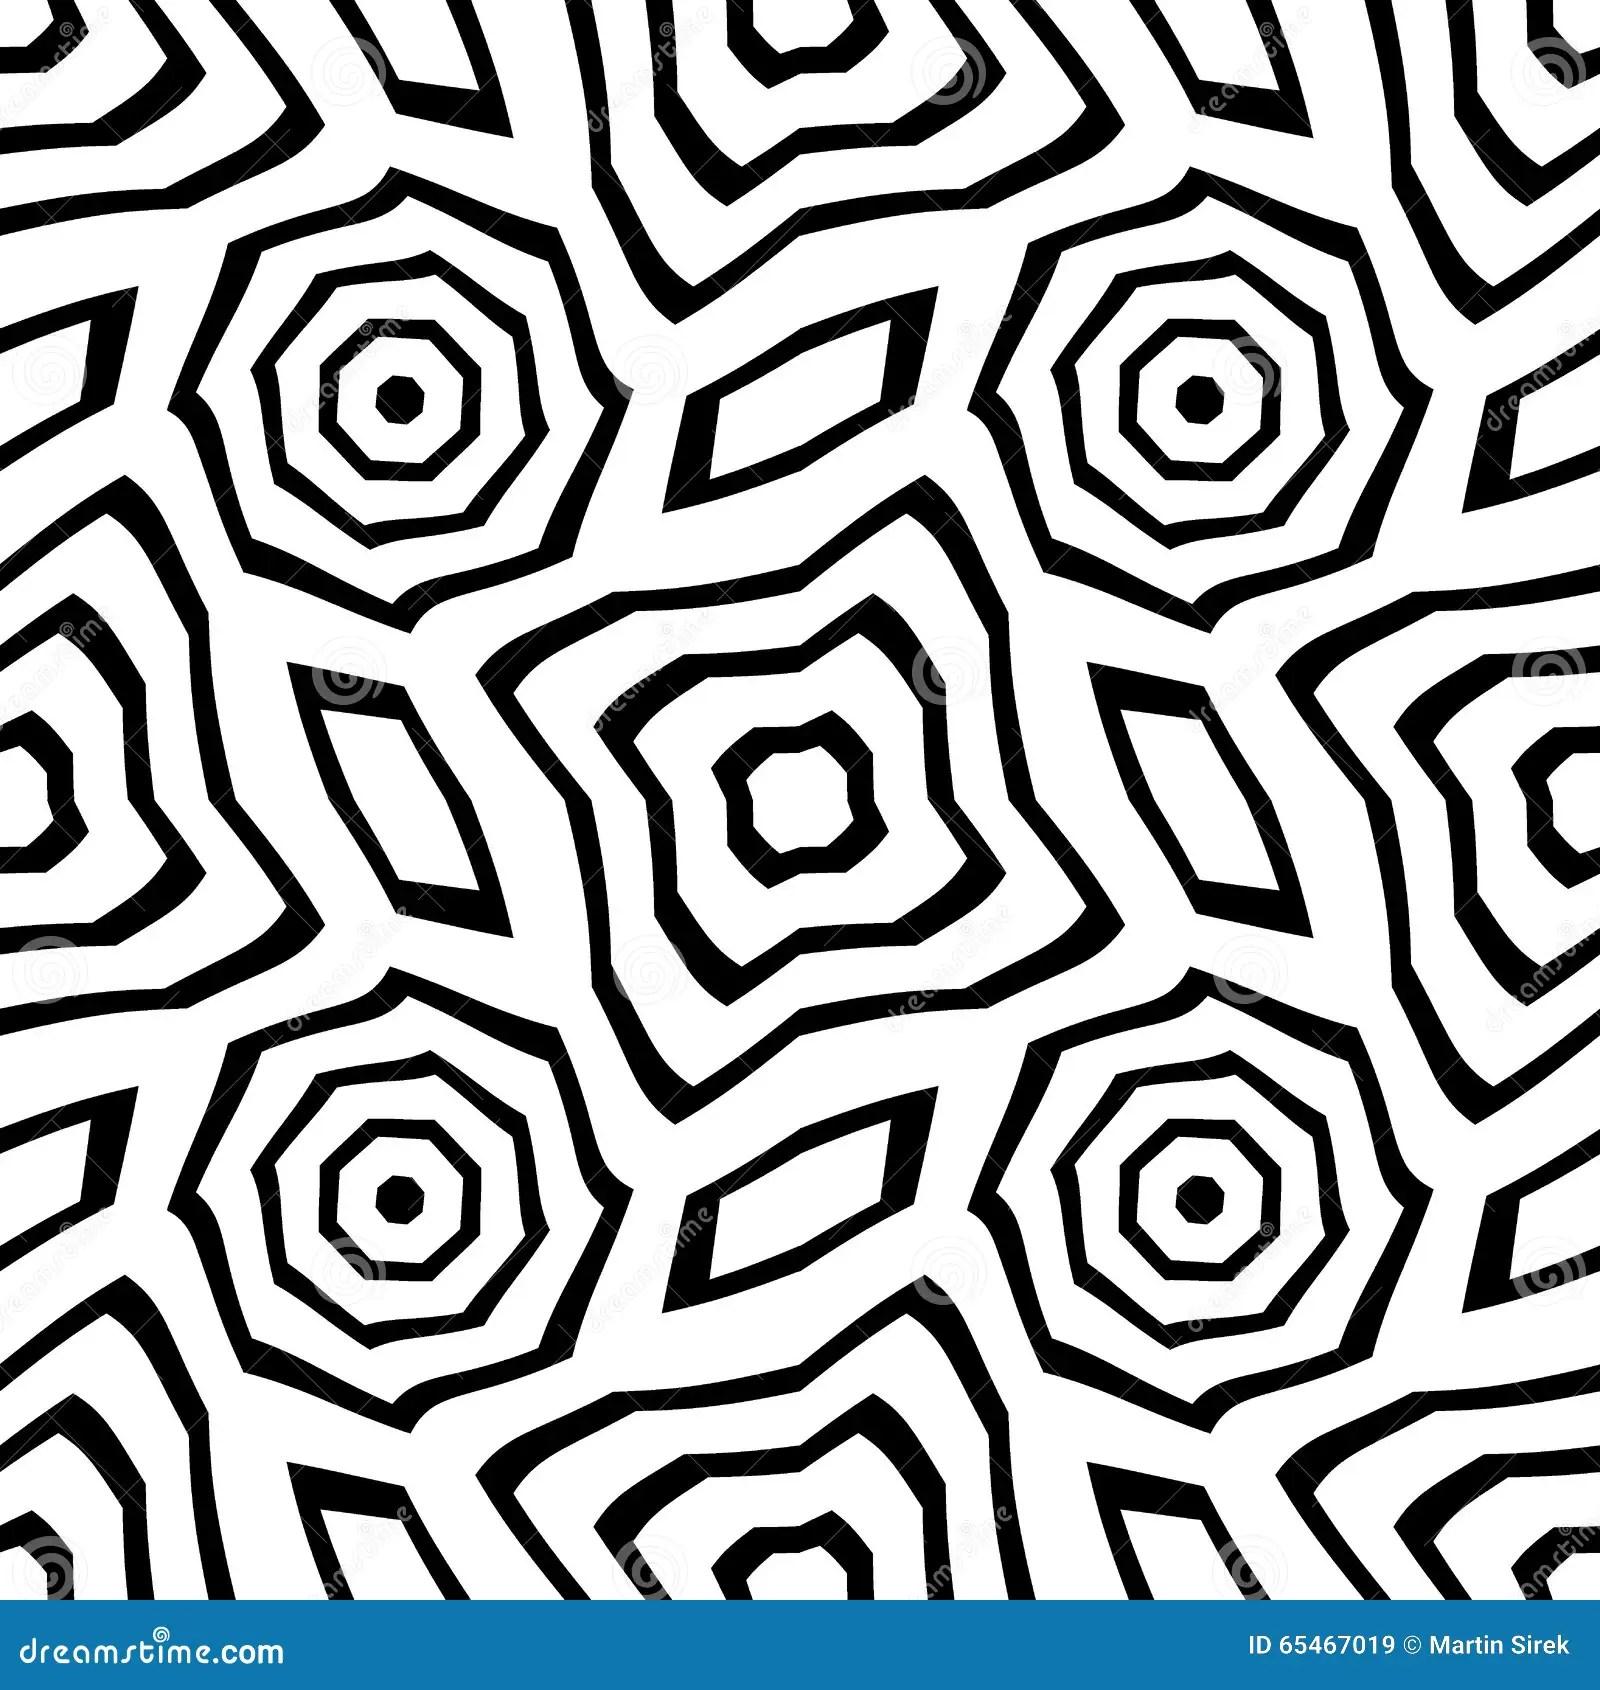 Web Page Background Patterns